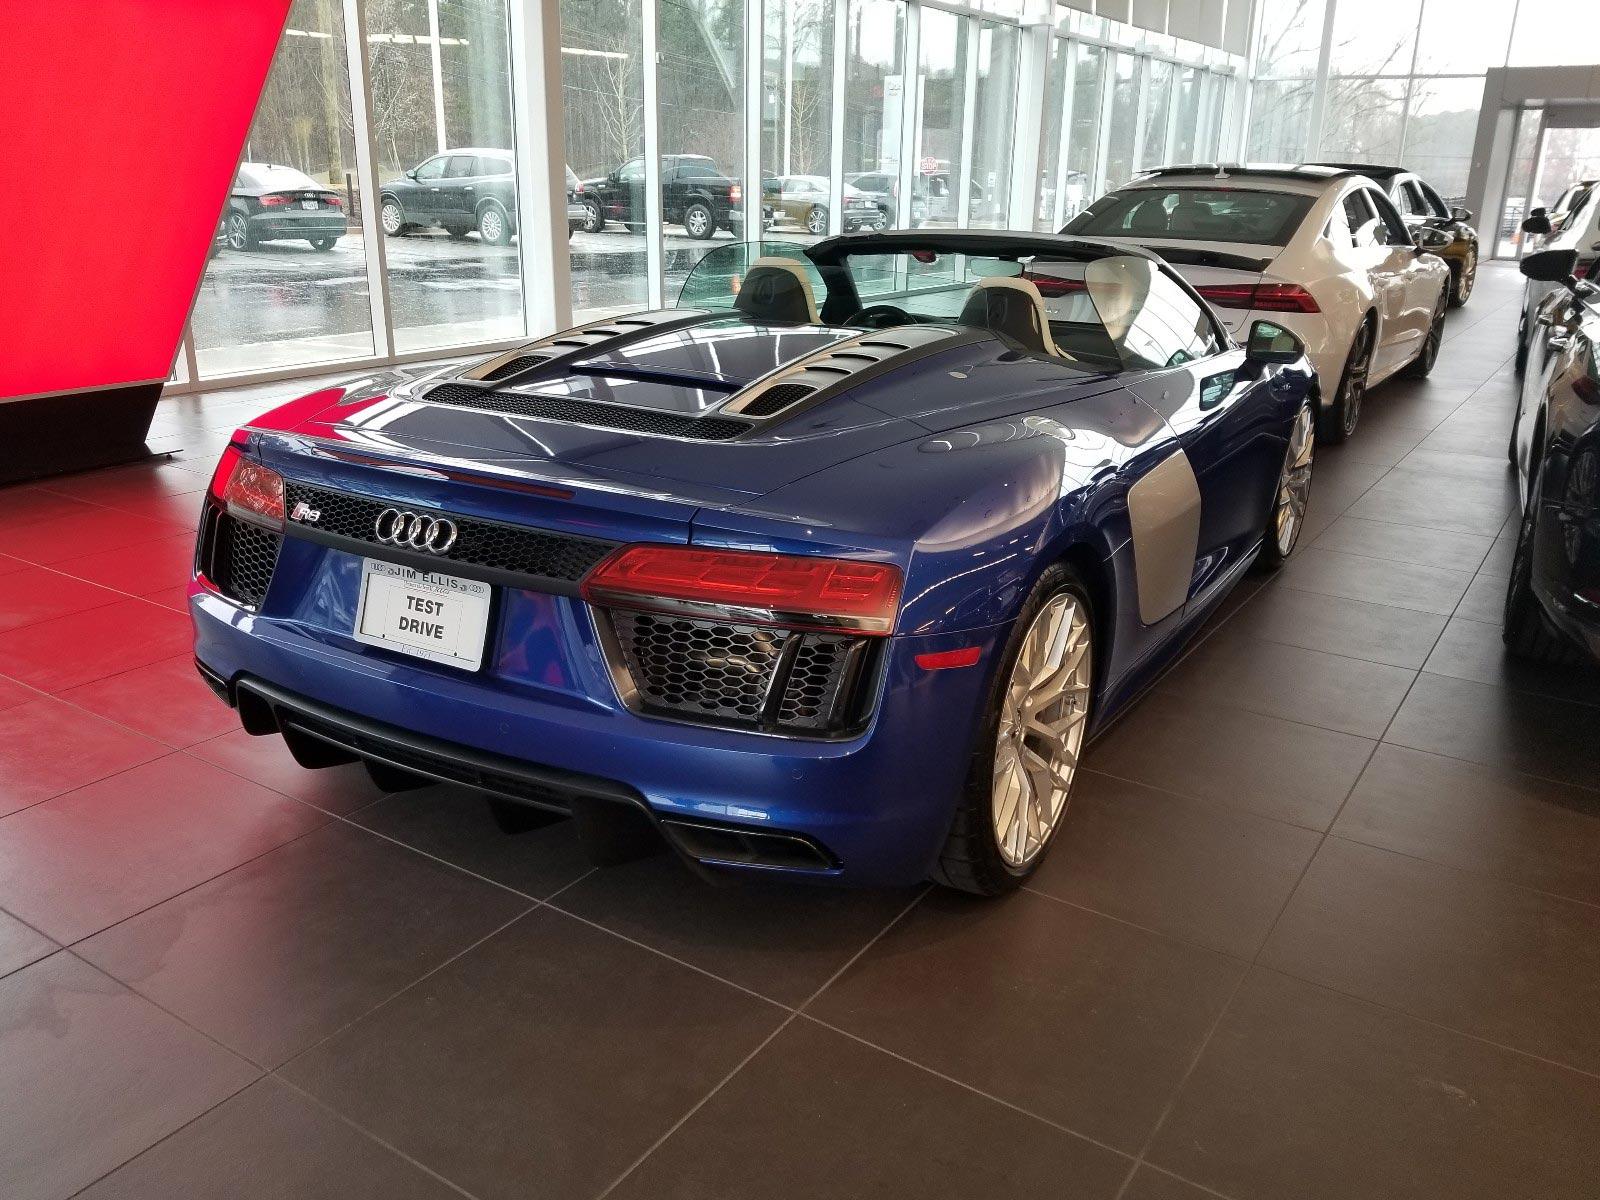 Convertible Audi R8